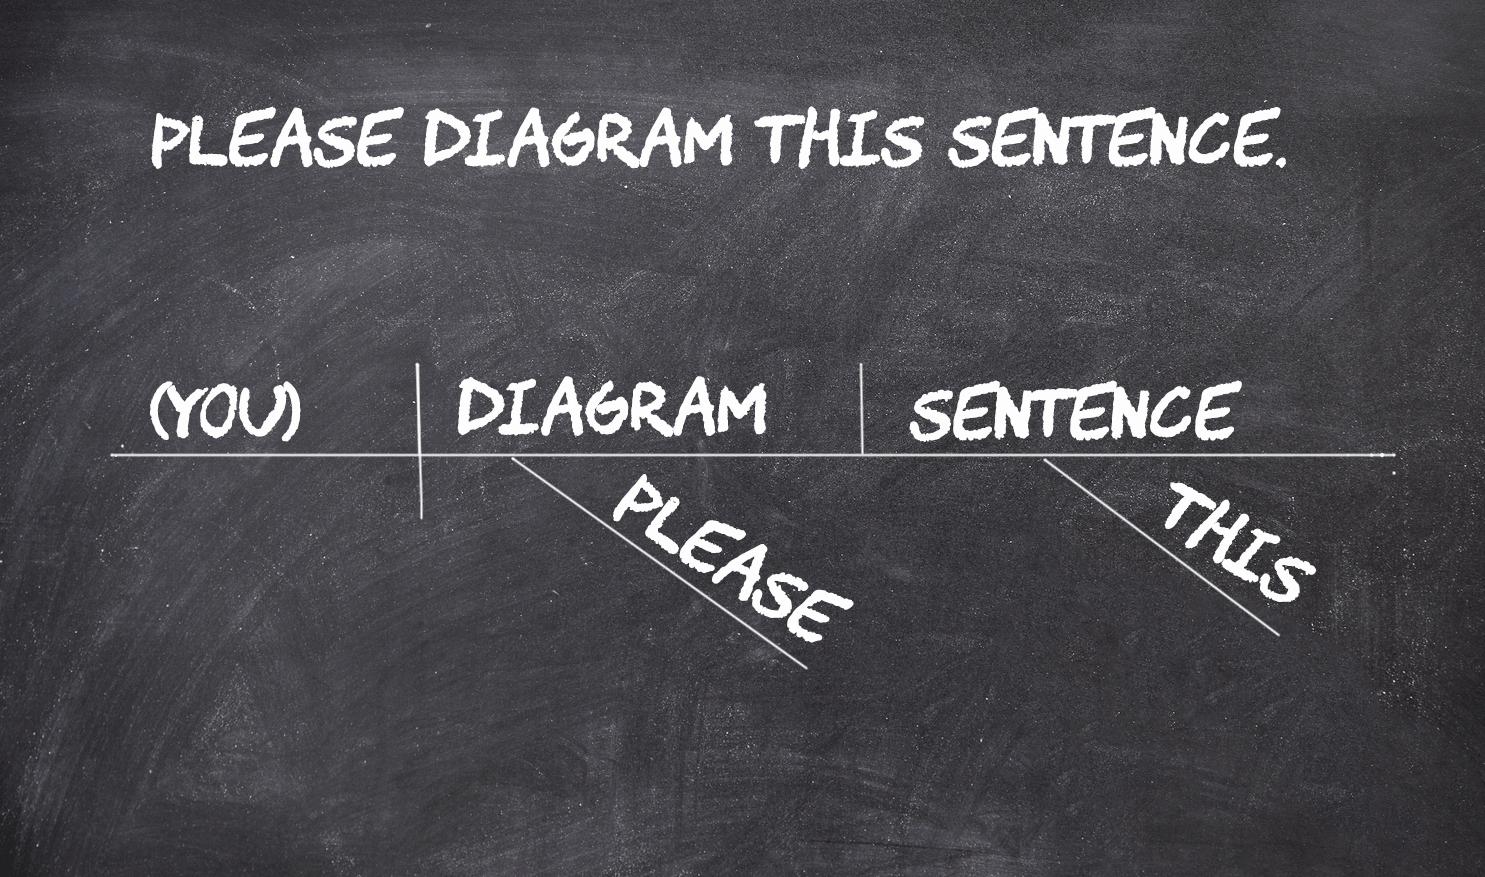 diagram my sentence online 2003 impala wiring diagramming sentences  resources surfnetkids